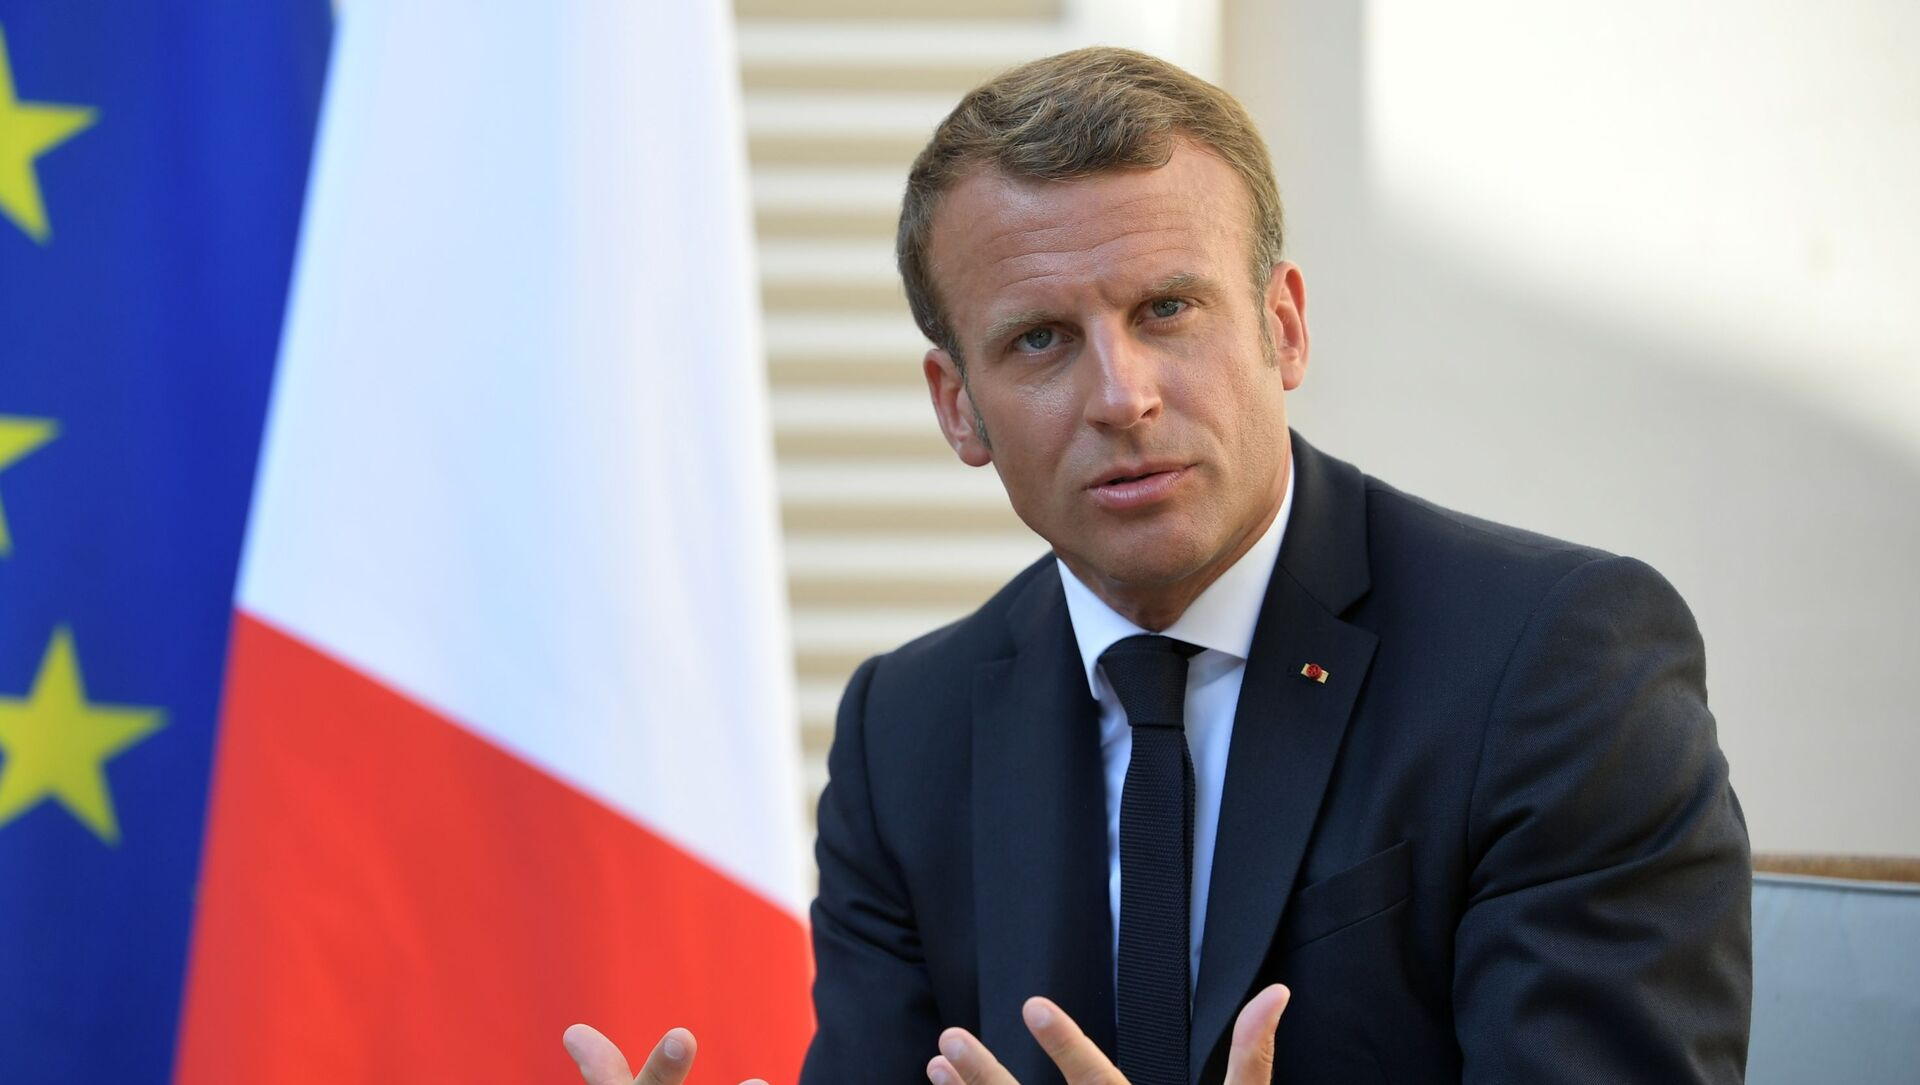 Tổng thống Pháp Emmanuel Macron - Sputnik Việt Nam, 1920, 28.09.2021